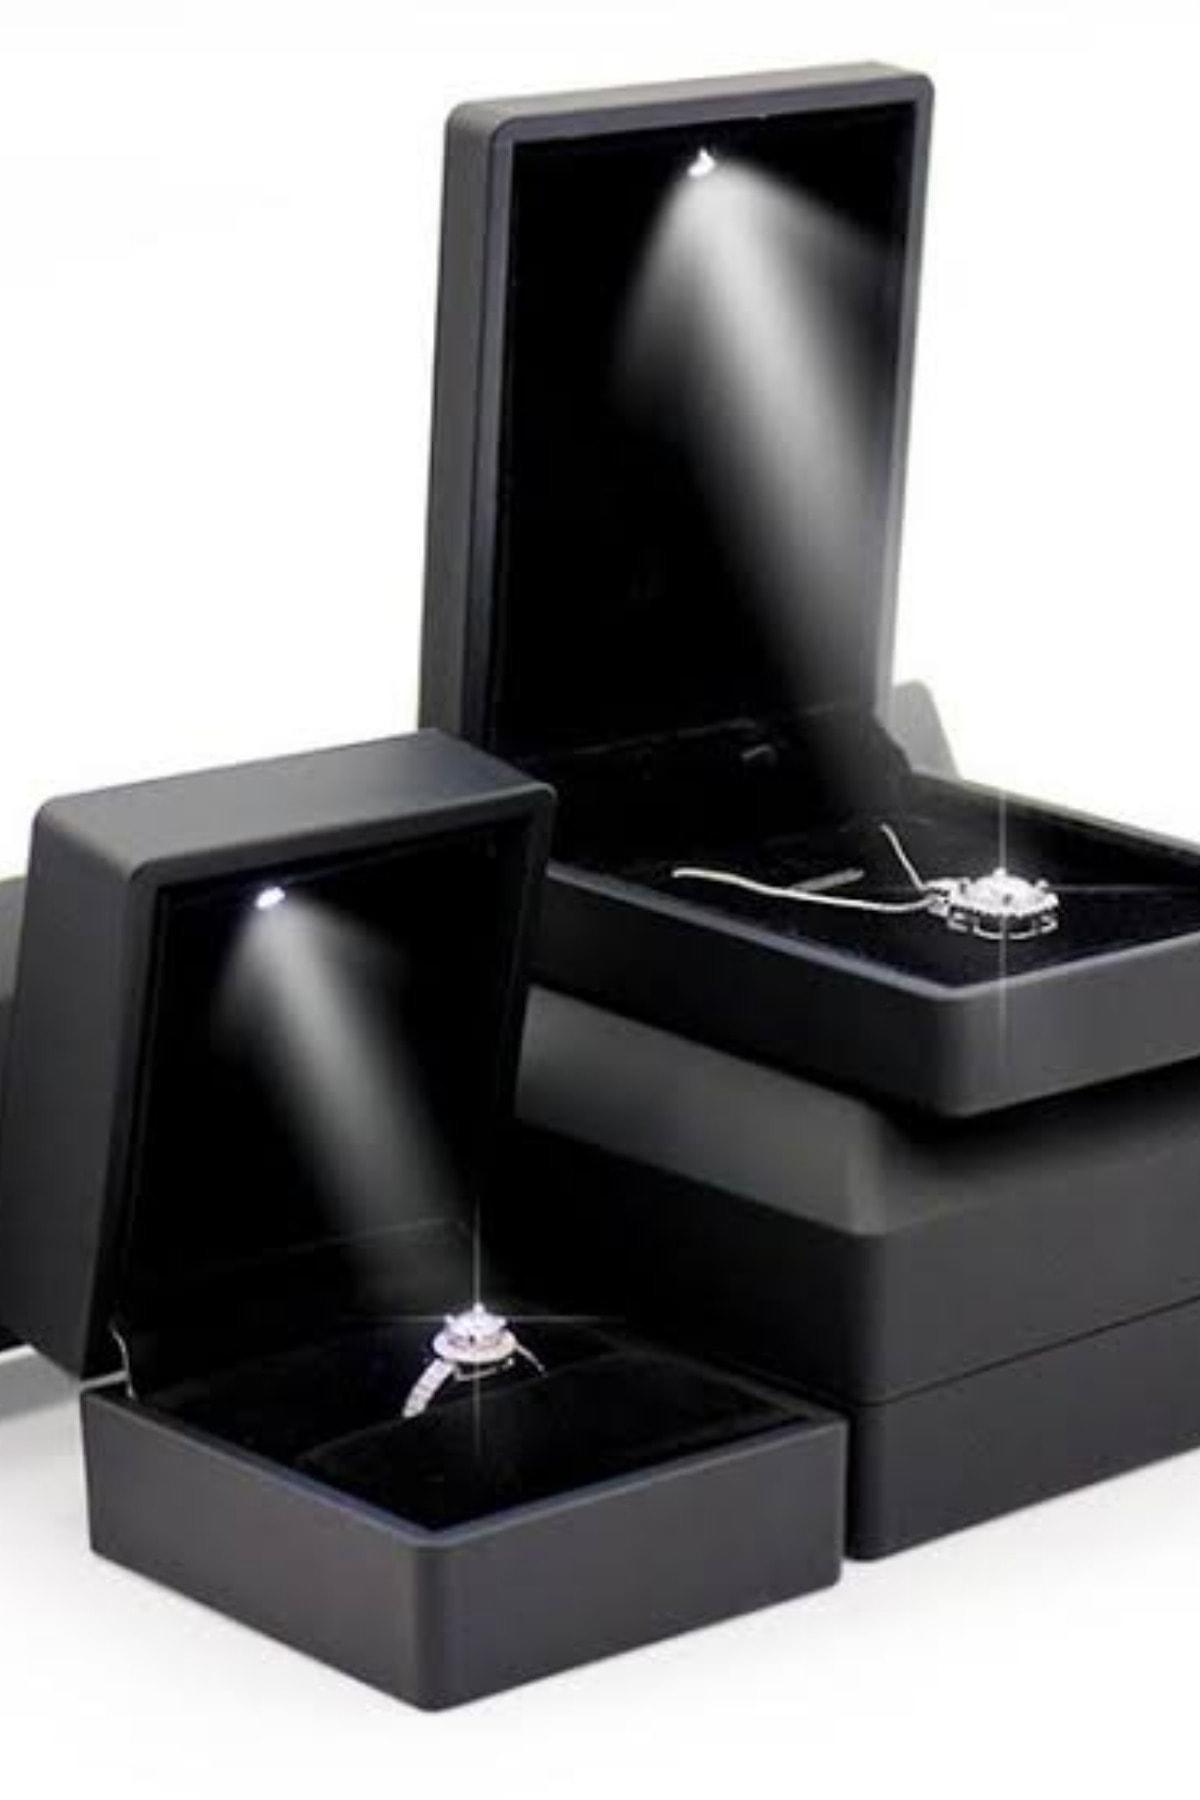 Crystal Diamond Zirconia Işıklı Kutuda Laboratuvar Pırlantası 0.50 Carat Tektaş Yüzük 2